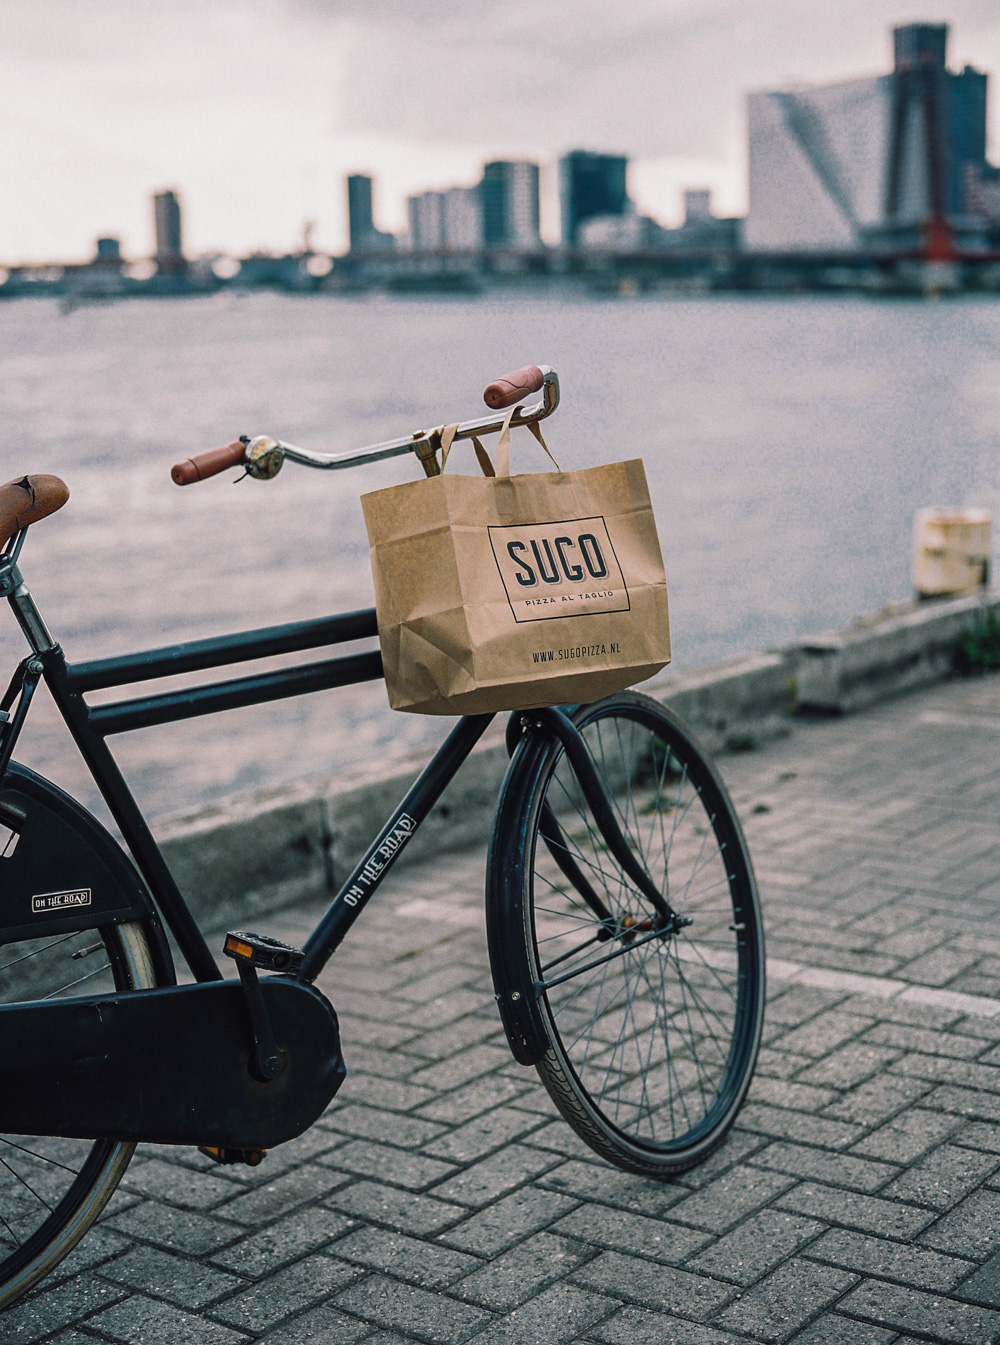 hanke-arkenbout-inspire-styling-sugo-pizza-27.jpg